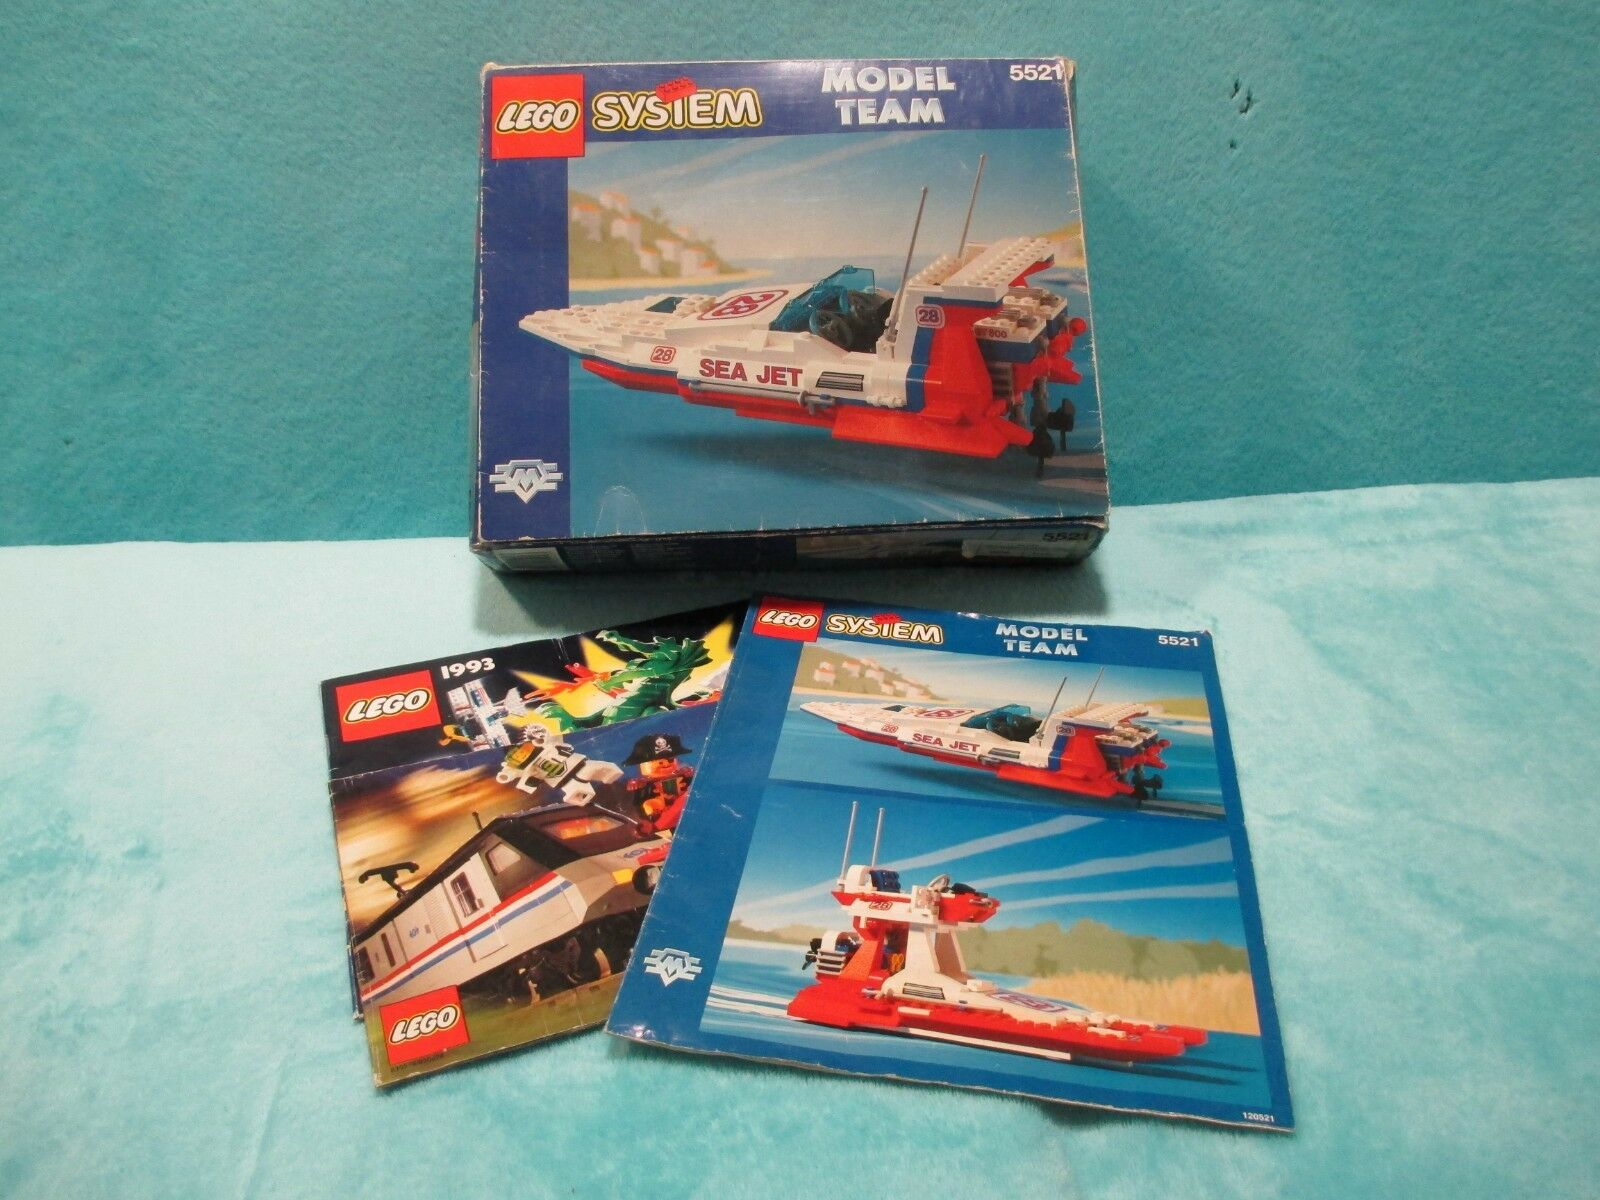 BOXED LEGO System Model Team Set 5521 Sea Jet Boat W  Instructions - XMAS GIFT